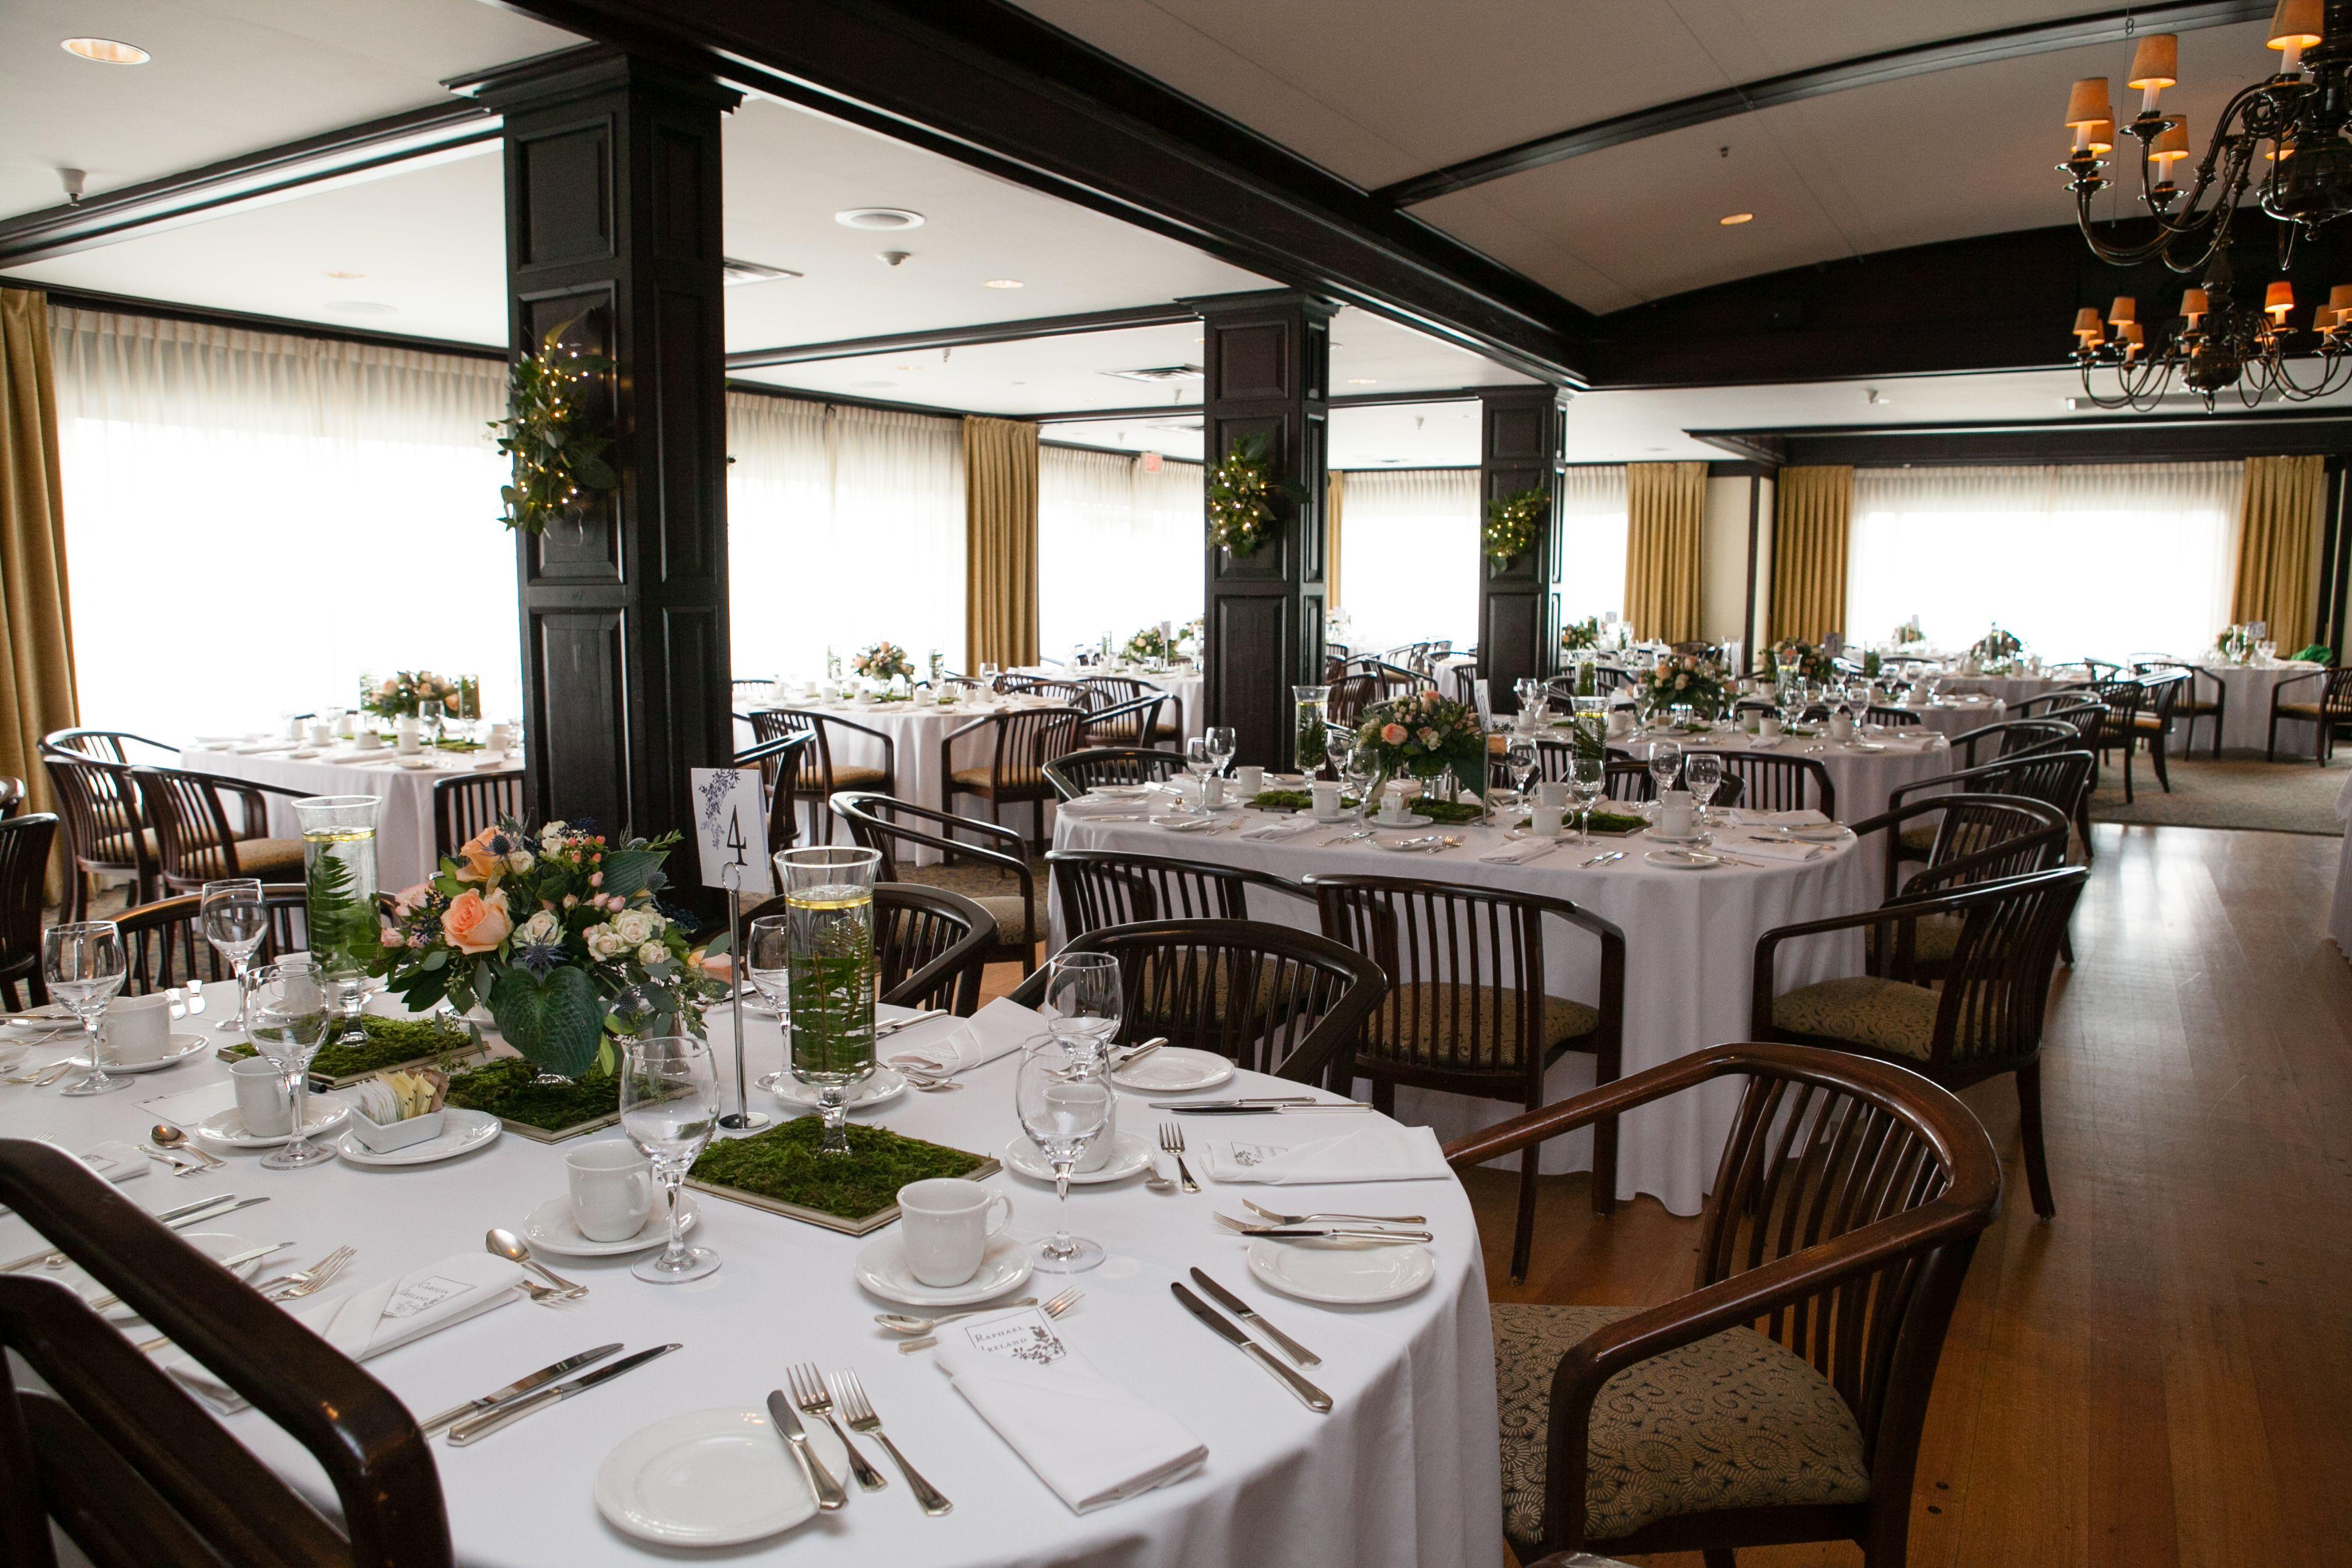 Wedding reception venue capilano golf u country club i was so